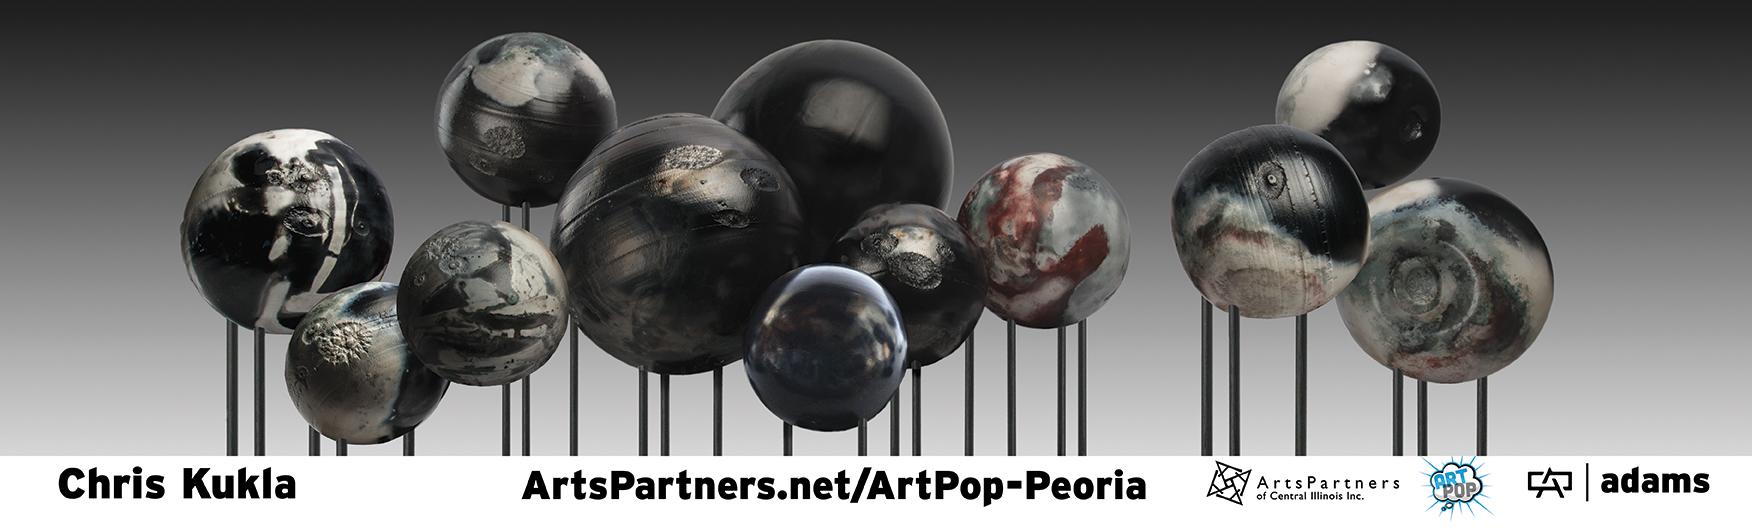 ArtsPartners_ART POP_14x48_Kukla.jpeg